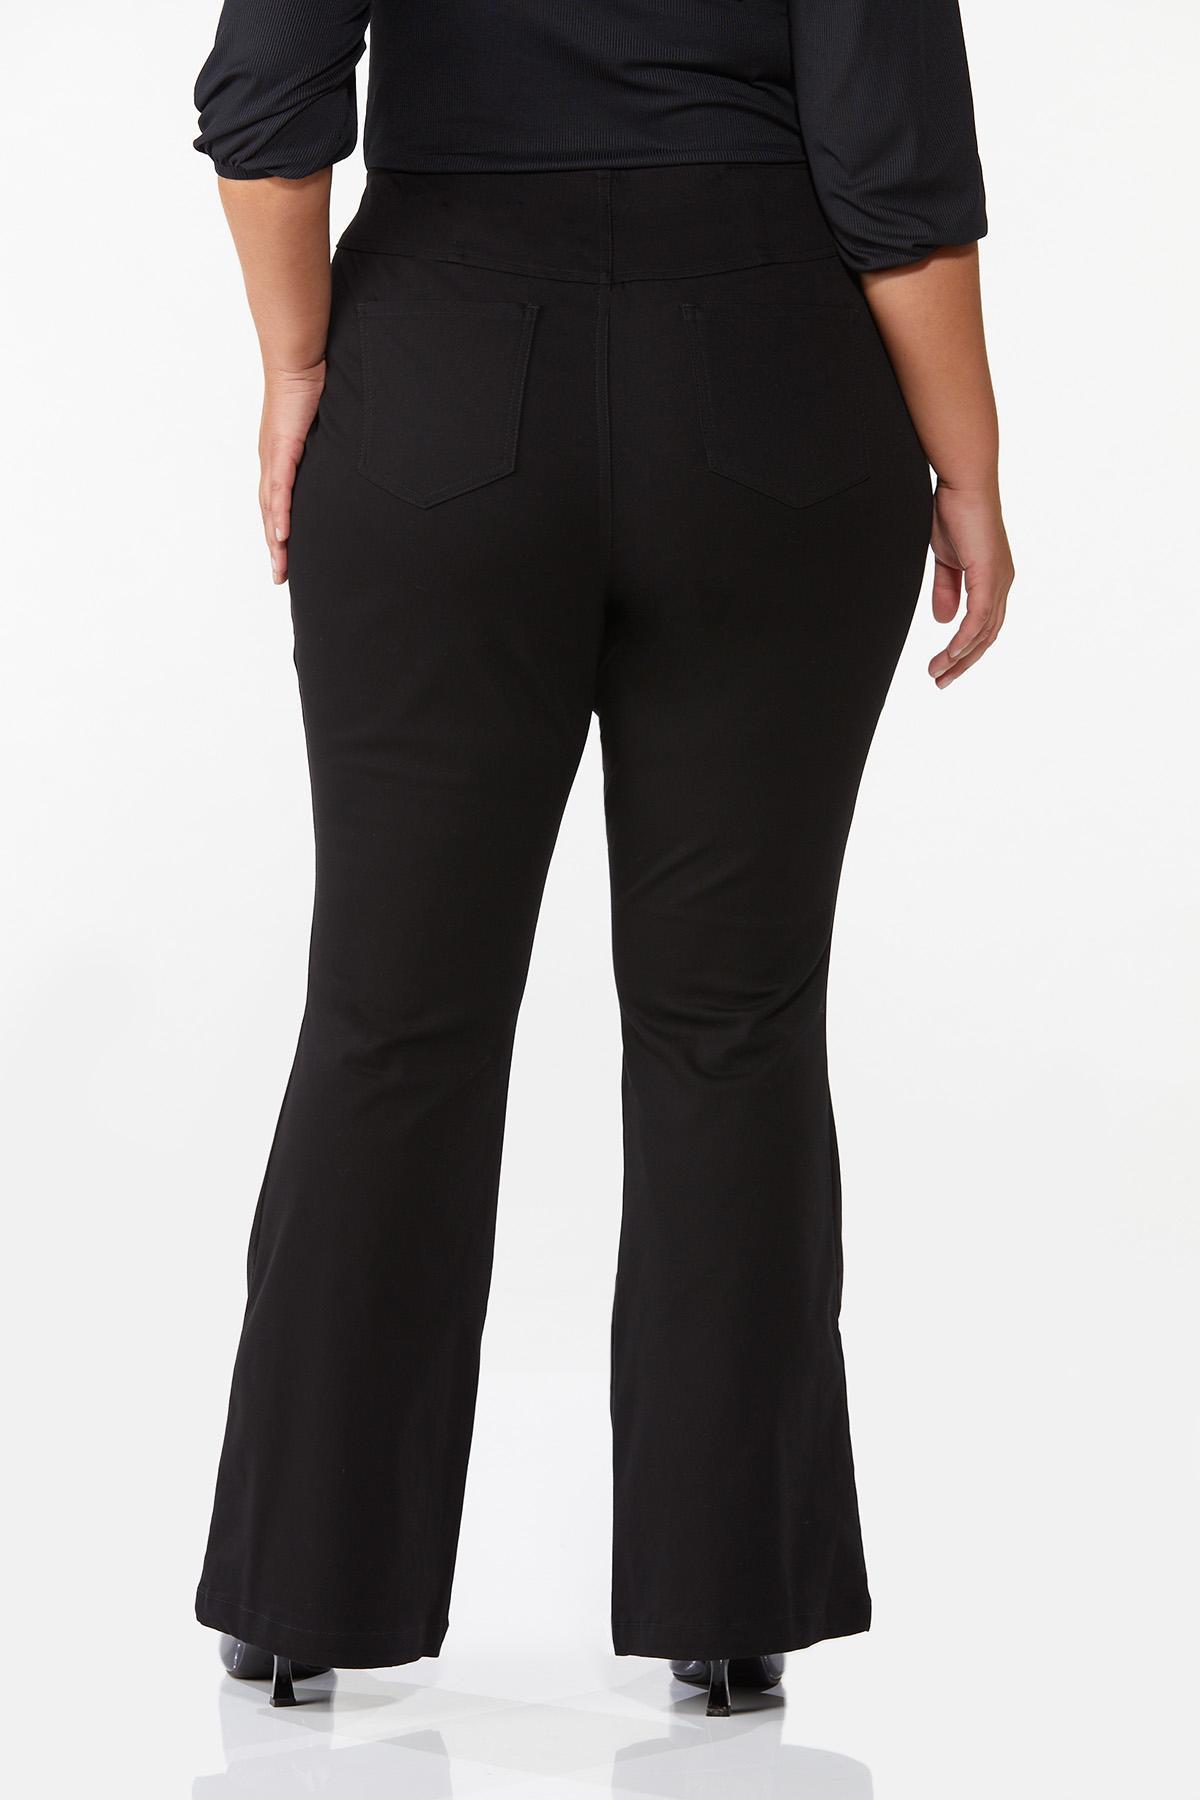 Plus Size Solid Flare Pants (Item #44719265)